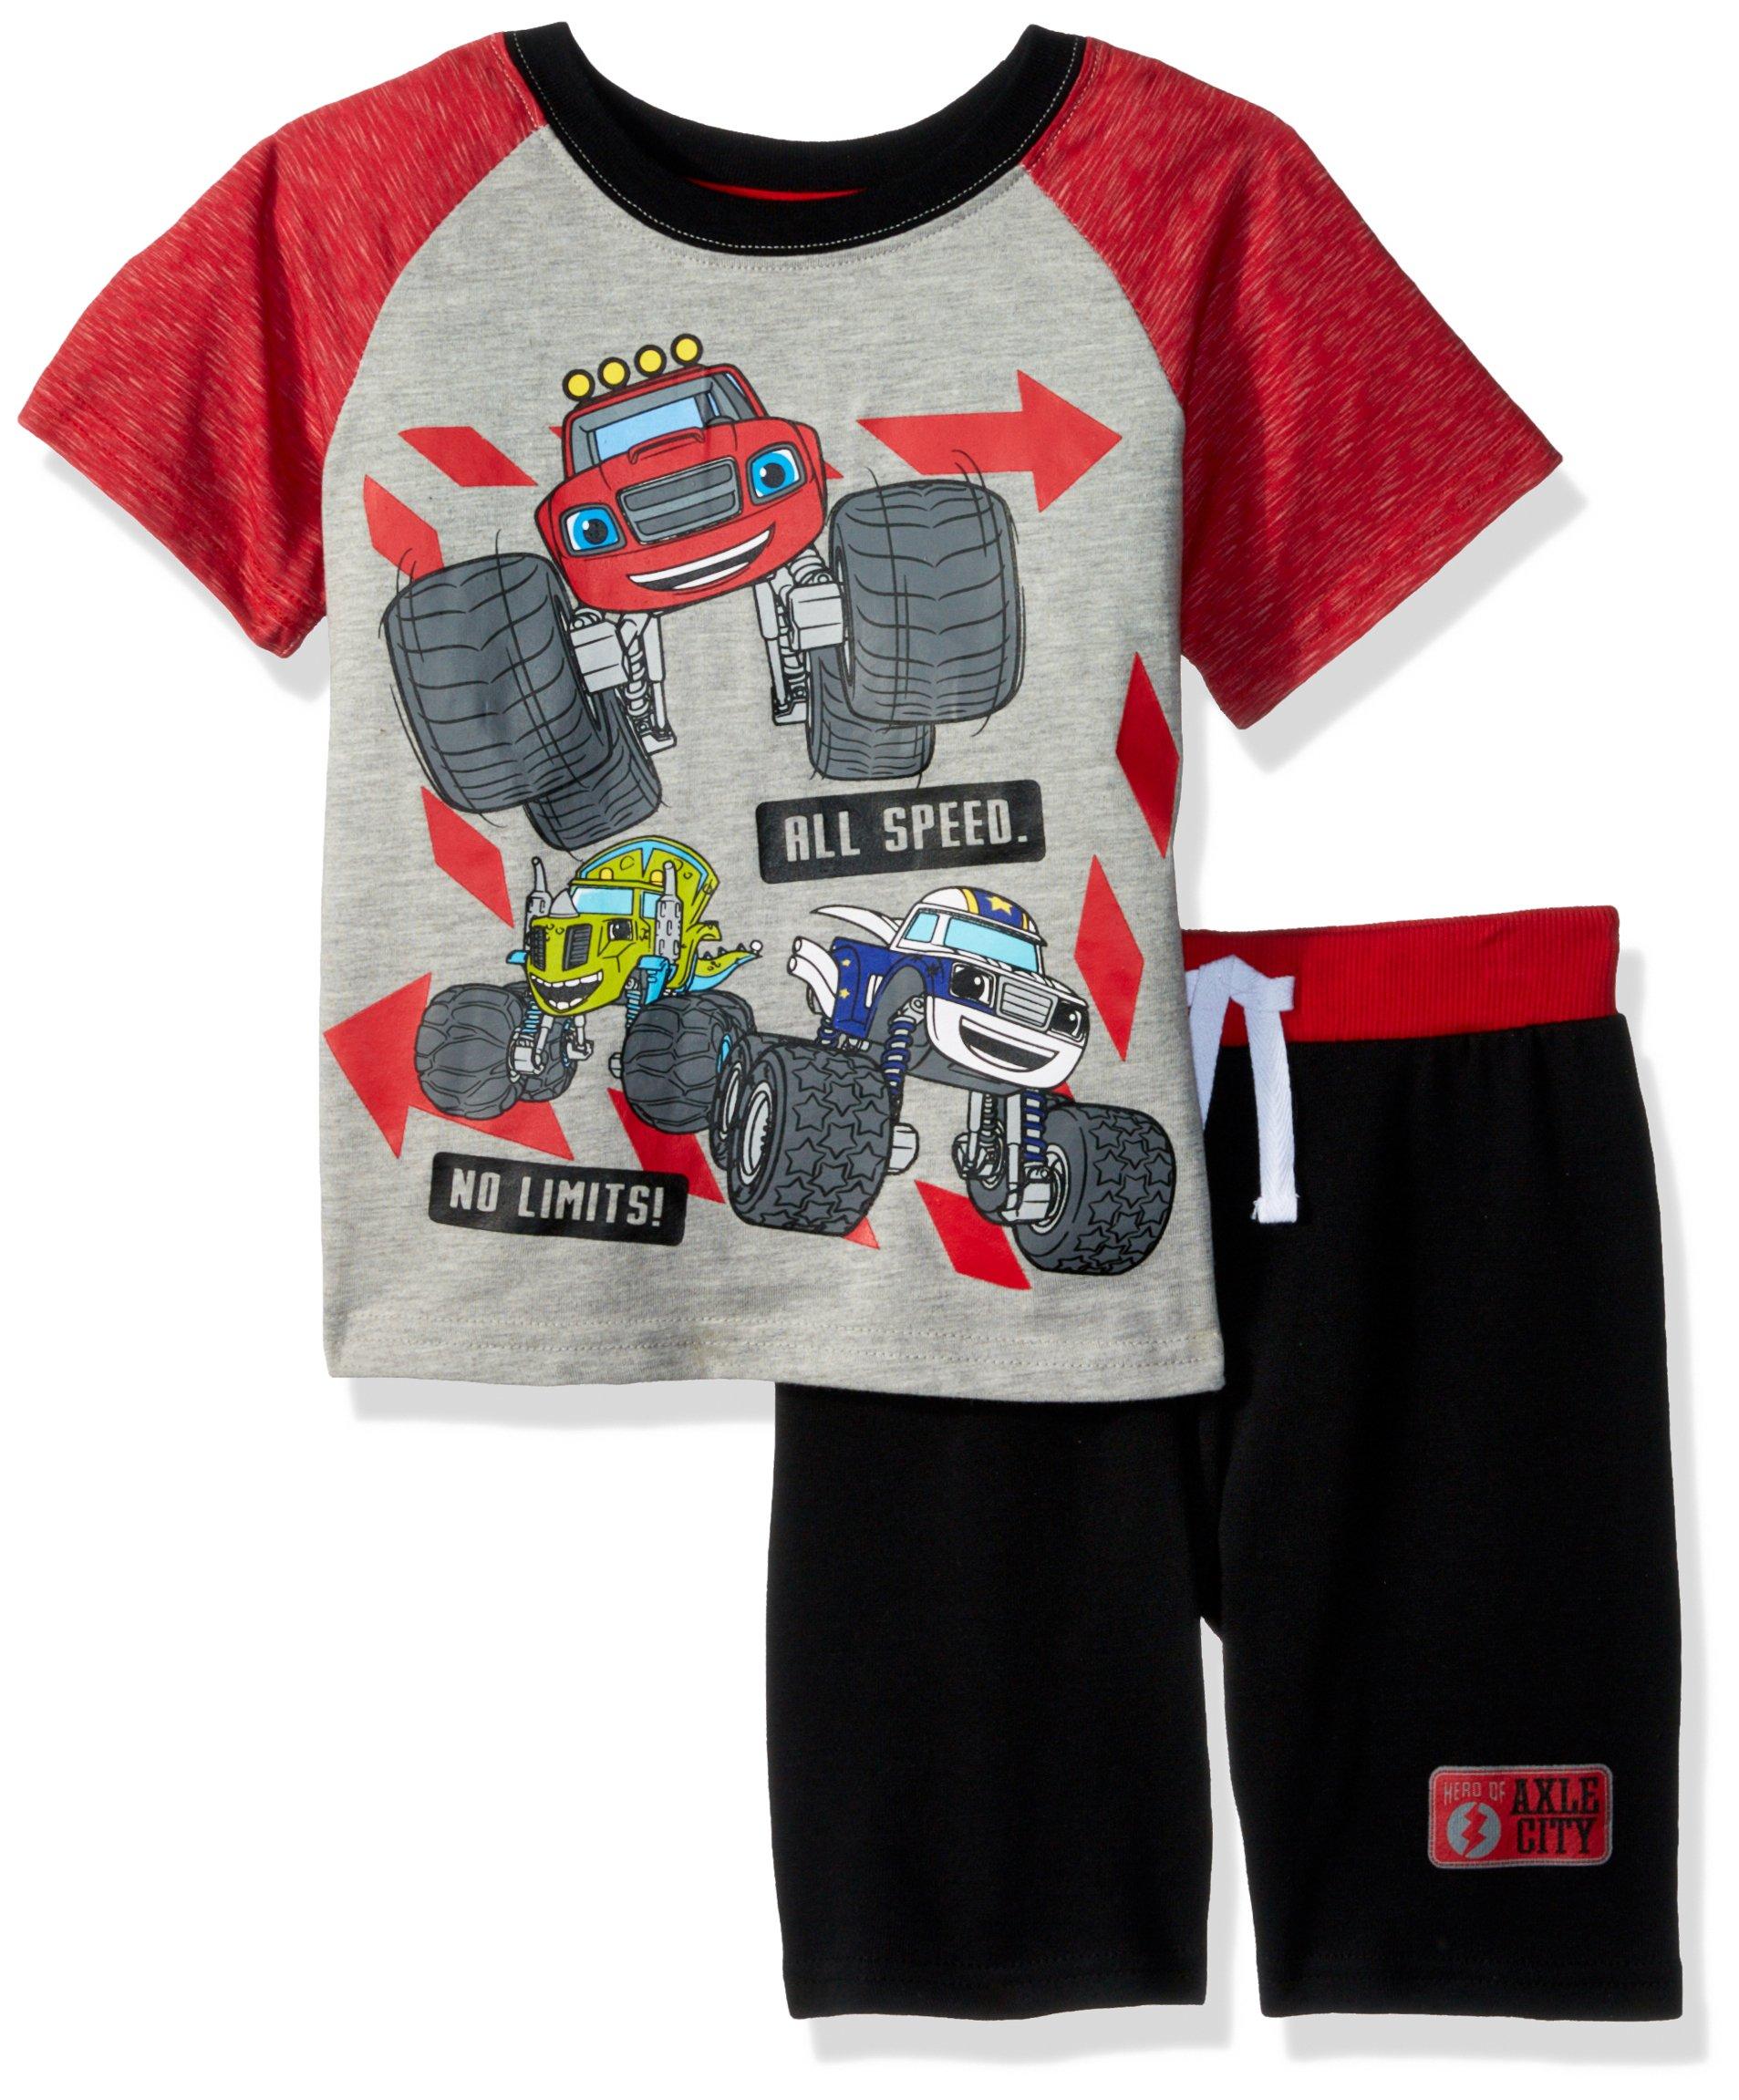 Nickelodeon Toddler Boys' Blaze Crew Neck Short Set, Grey, 4T